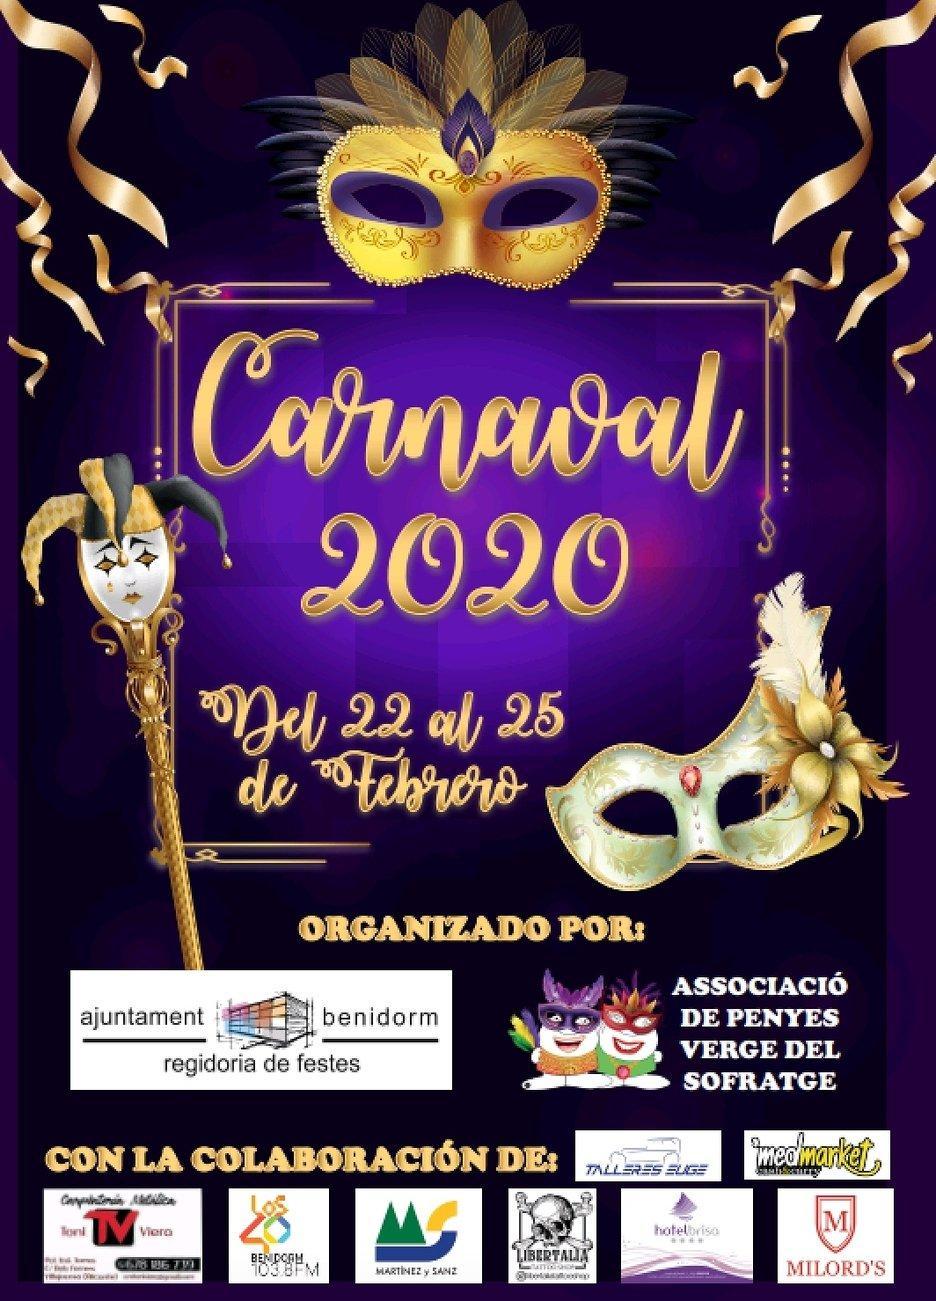 Carnaval Benidrorm